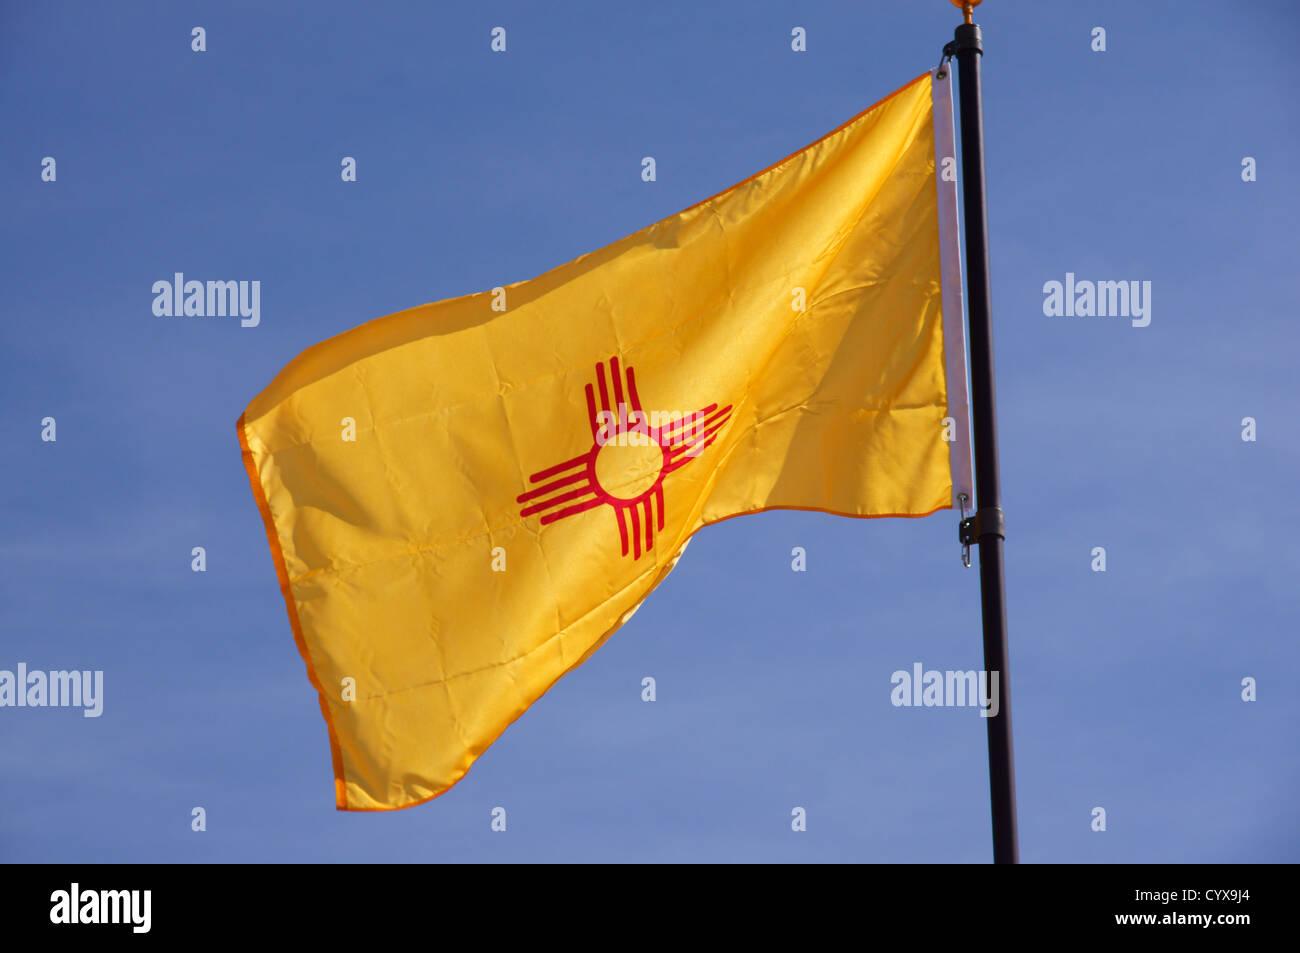 New mexico usa state flag yellow pennant symbol banner colors new mexico usa state flag yellow pennant symbol banner colors emblem ensign jack pennon standard streamer buycottarizona